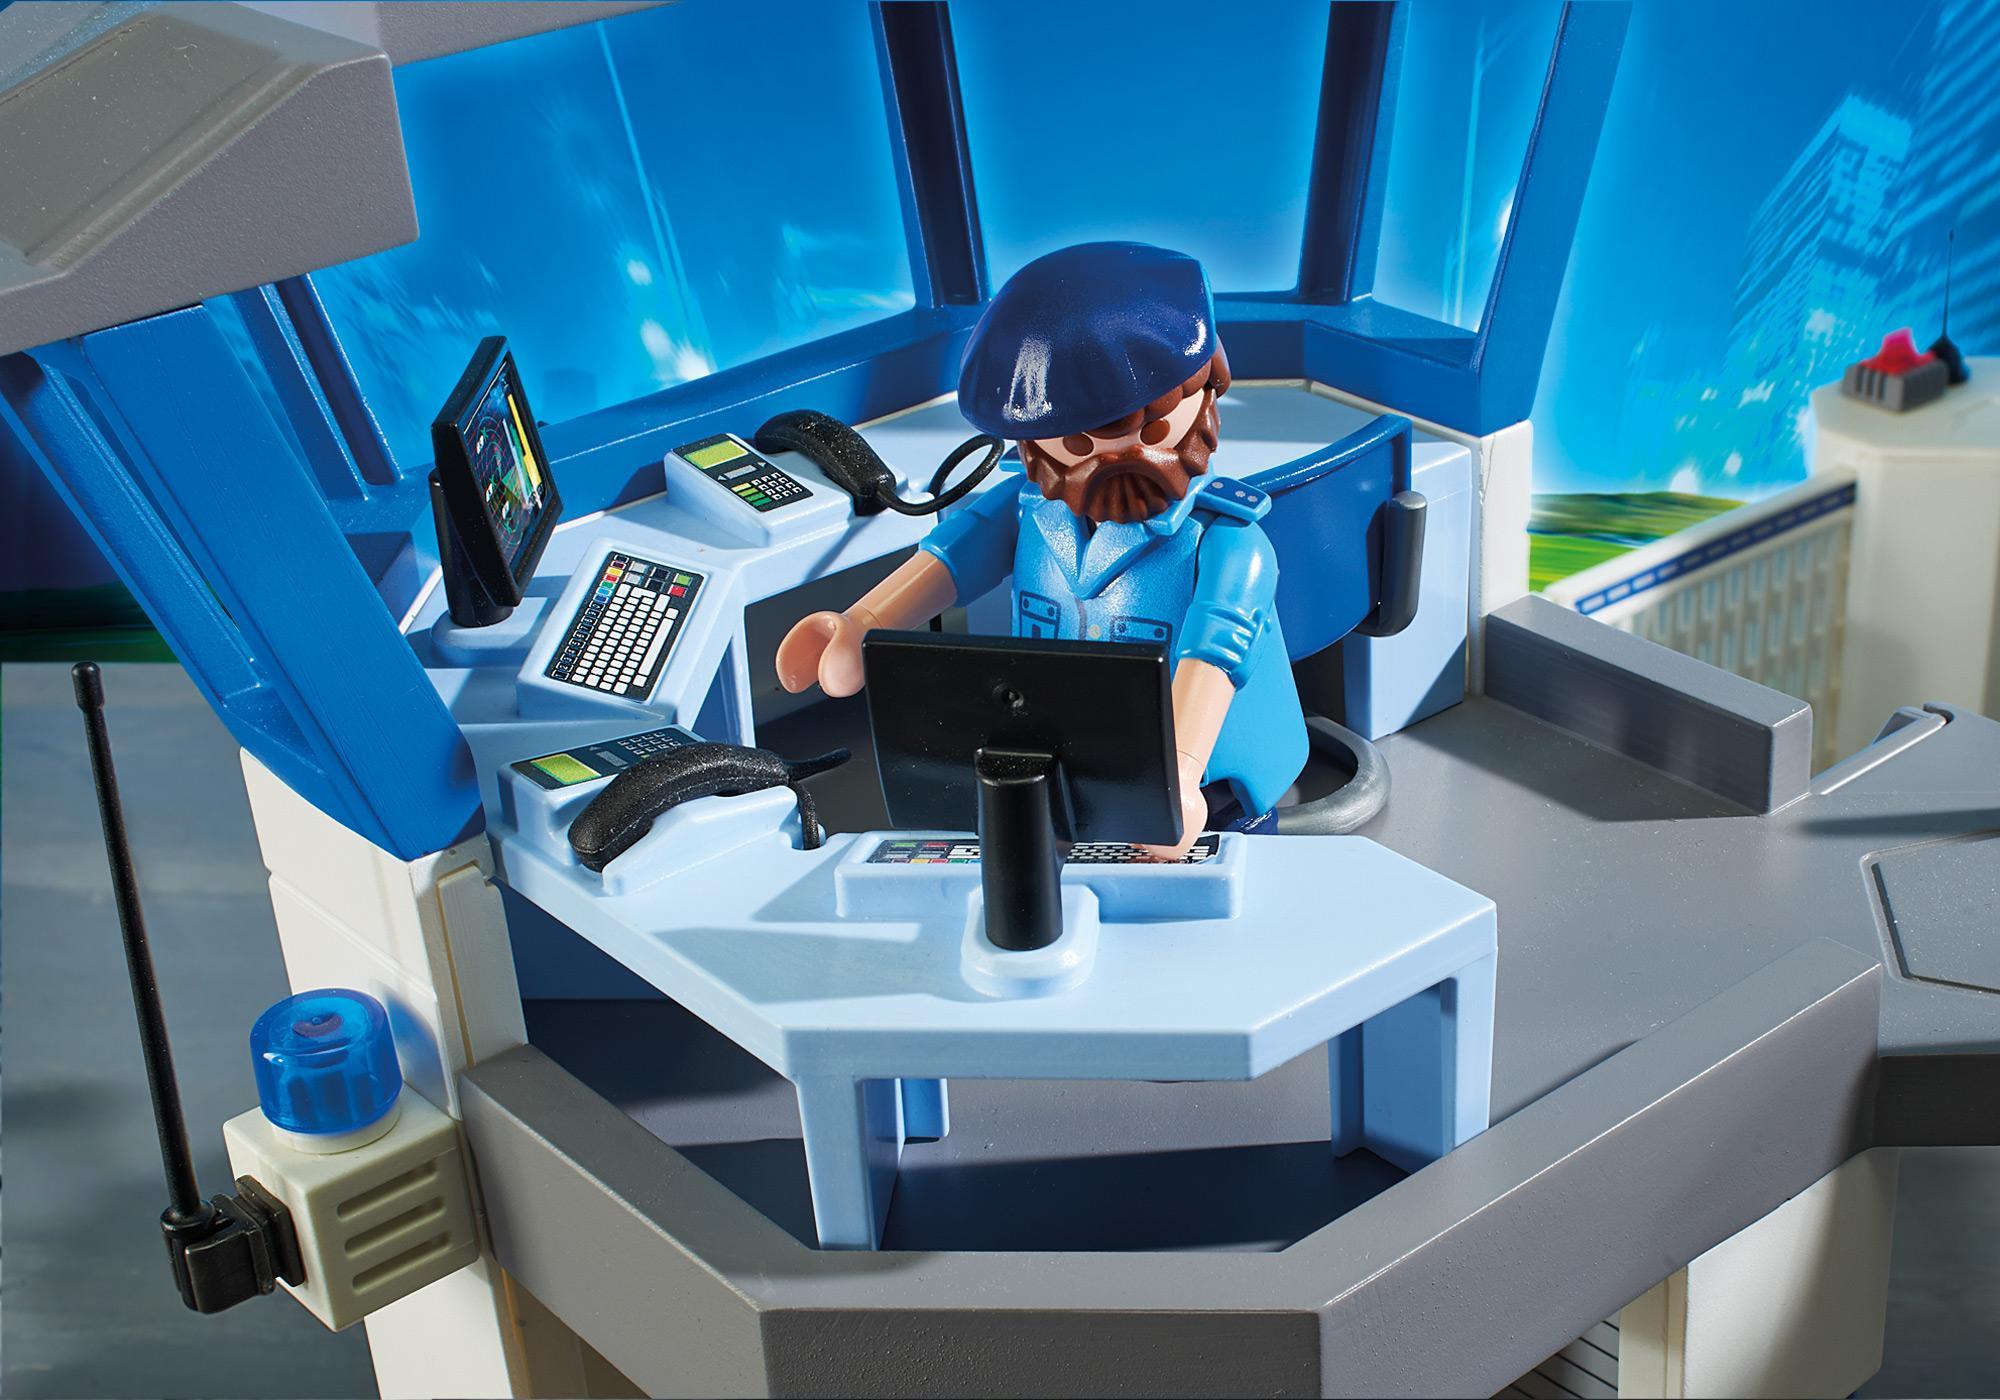 http://media.playmobil.com/i/playmobil/6919_product_extra5/Politiebureau met gevangenis